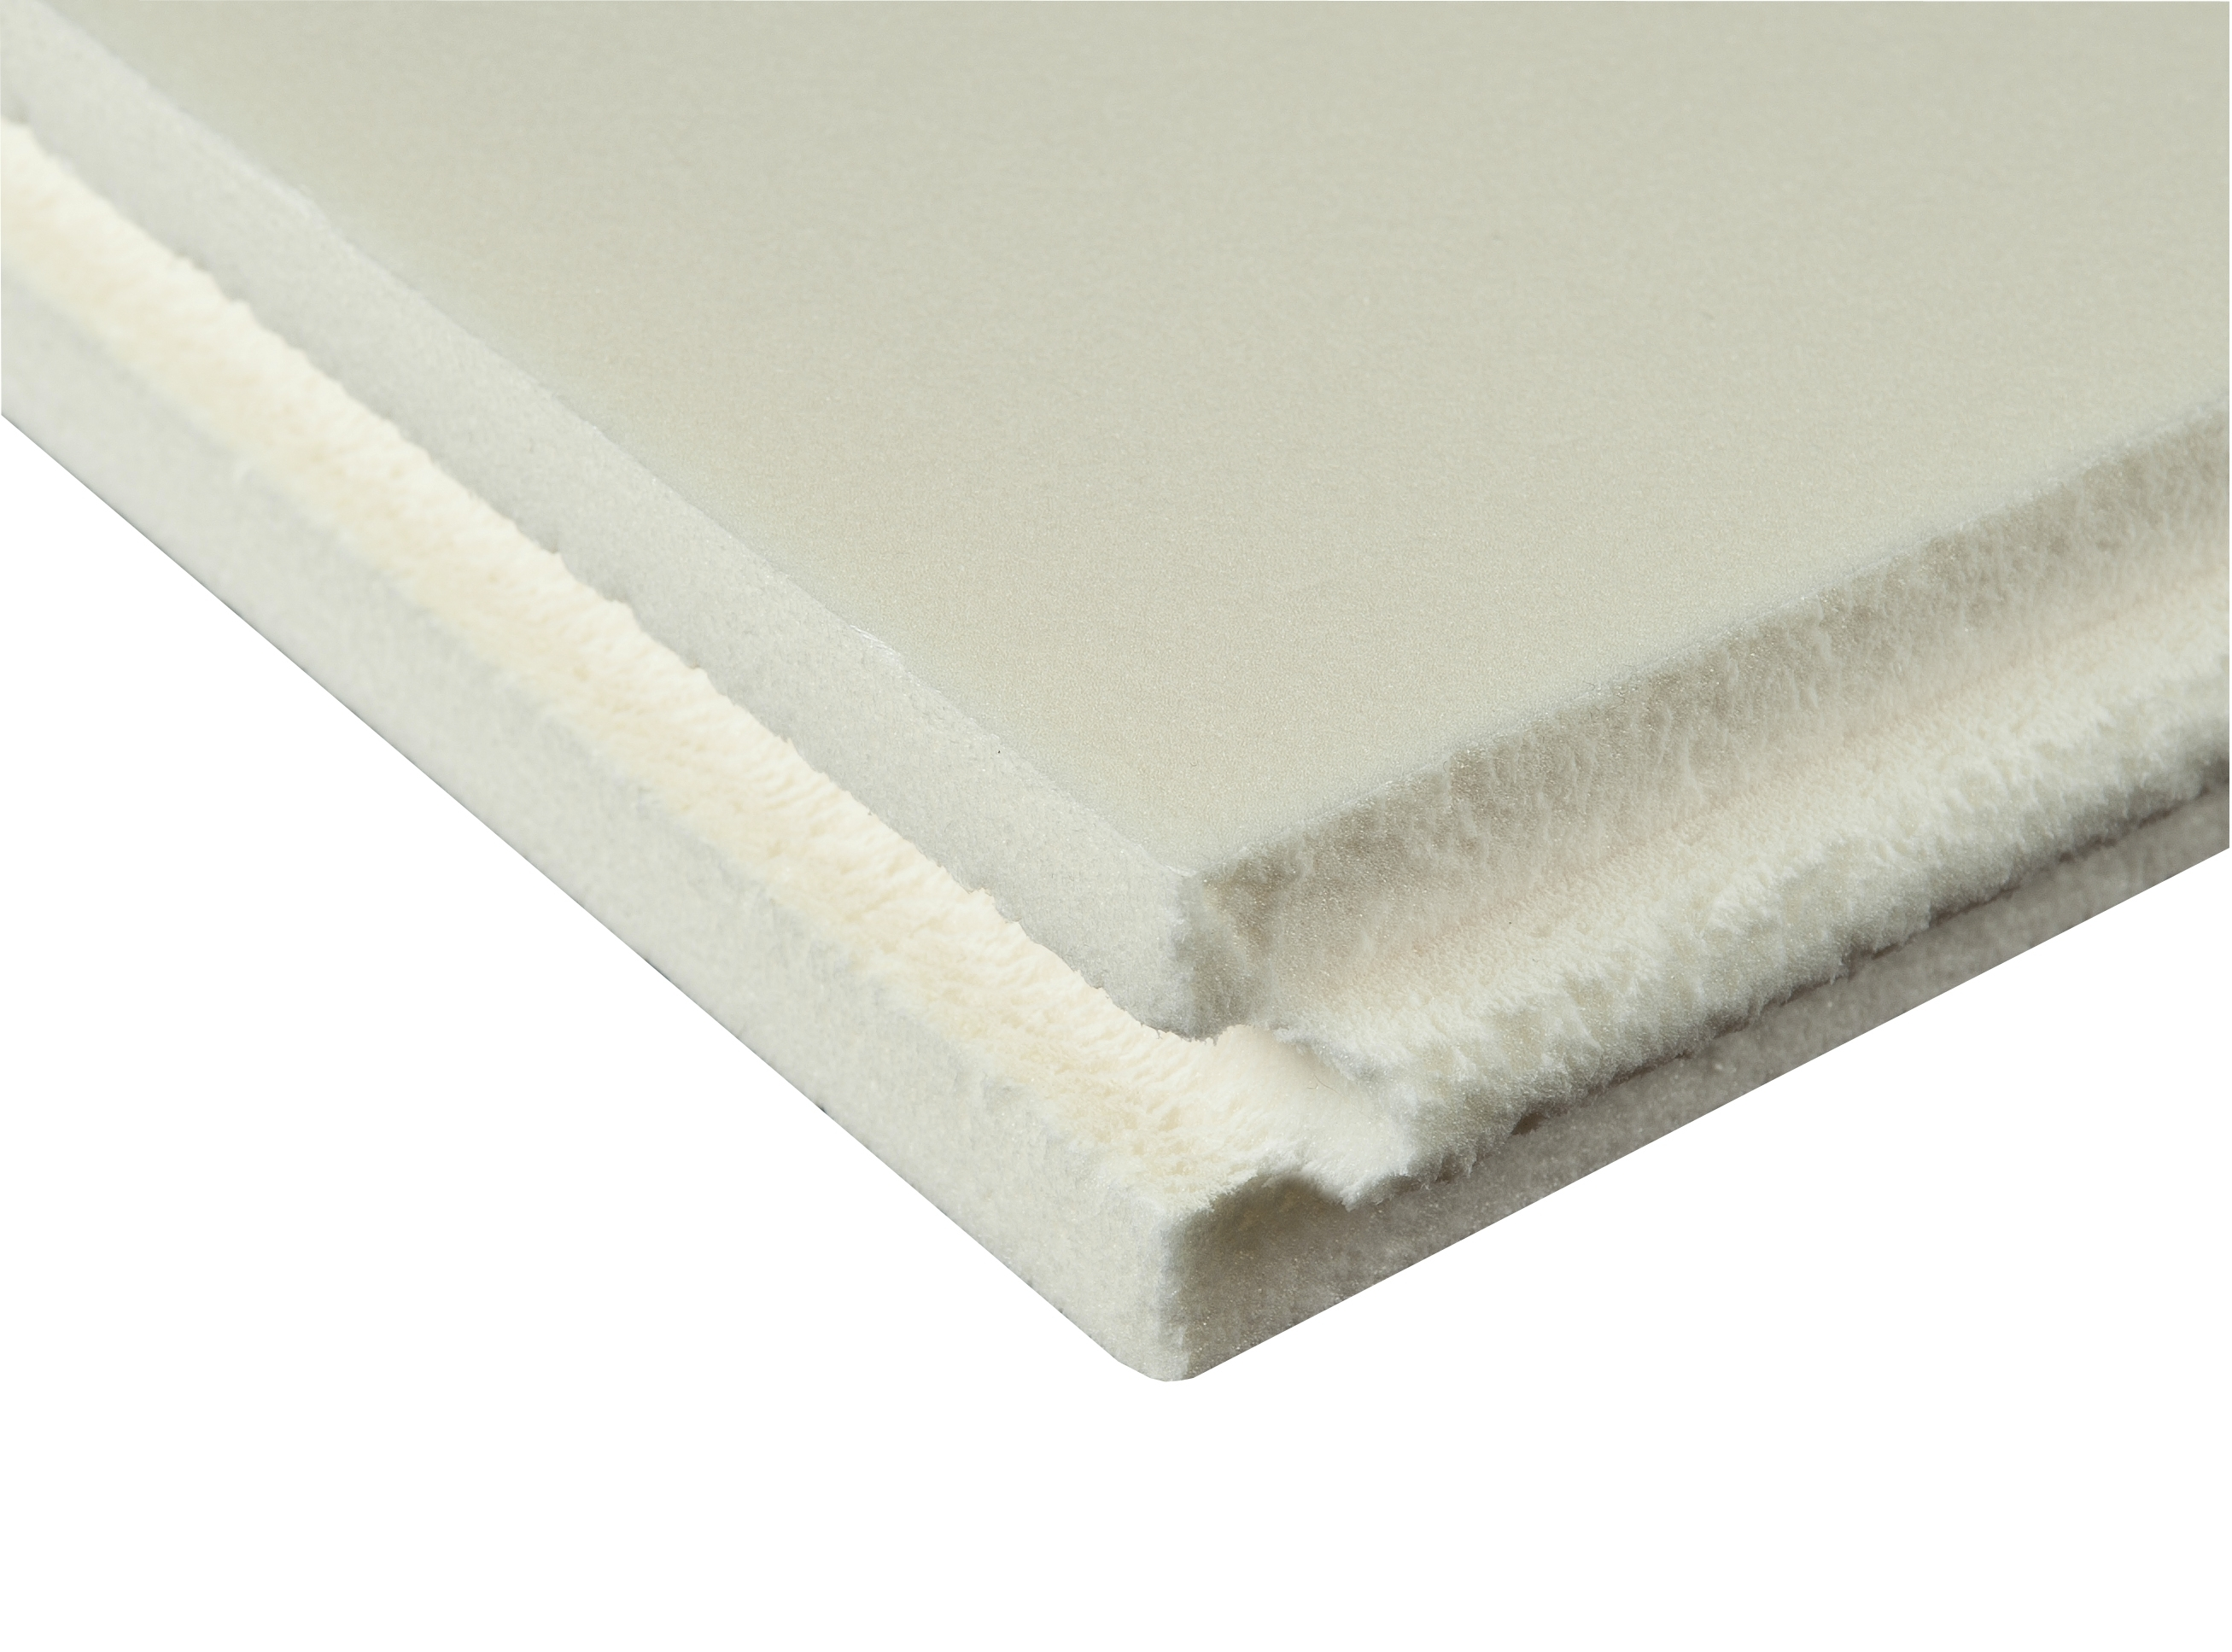 Panneau d 39 isolation polystyr ne extrud 5x60x120 cm r l rd 1 45 pol - Polystyrene extrude isolation ...